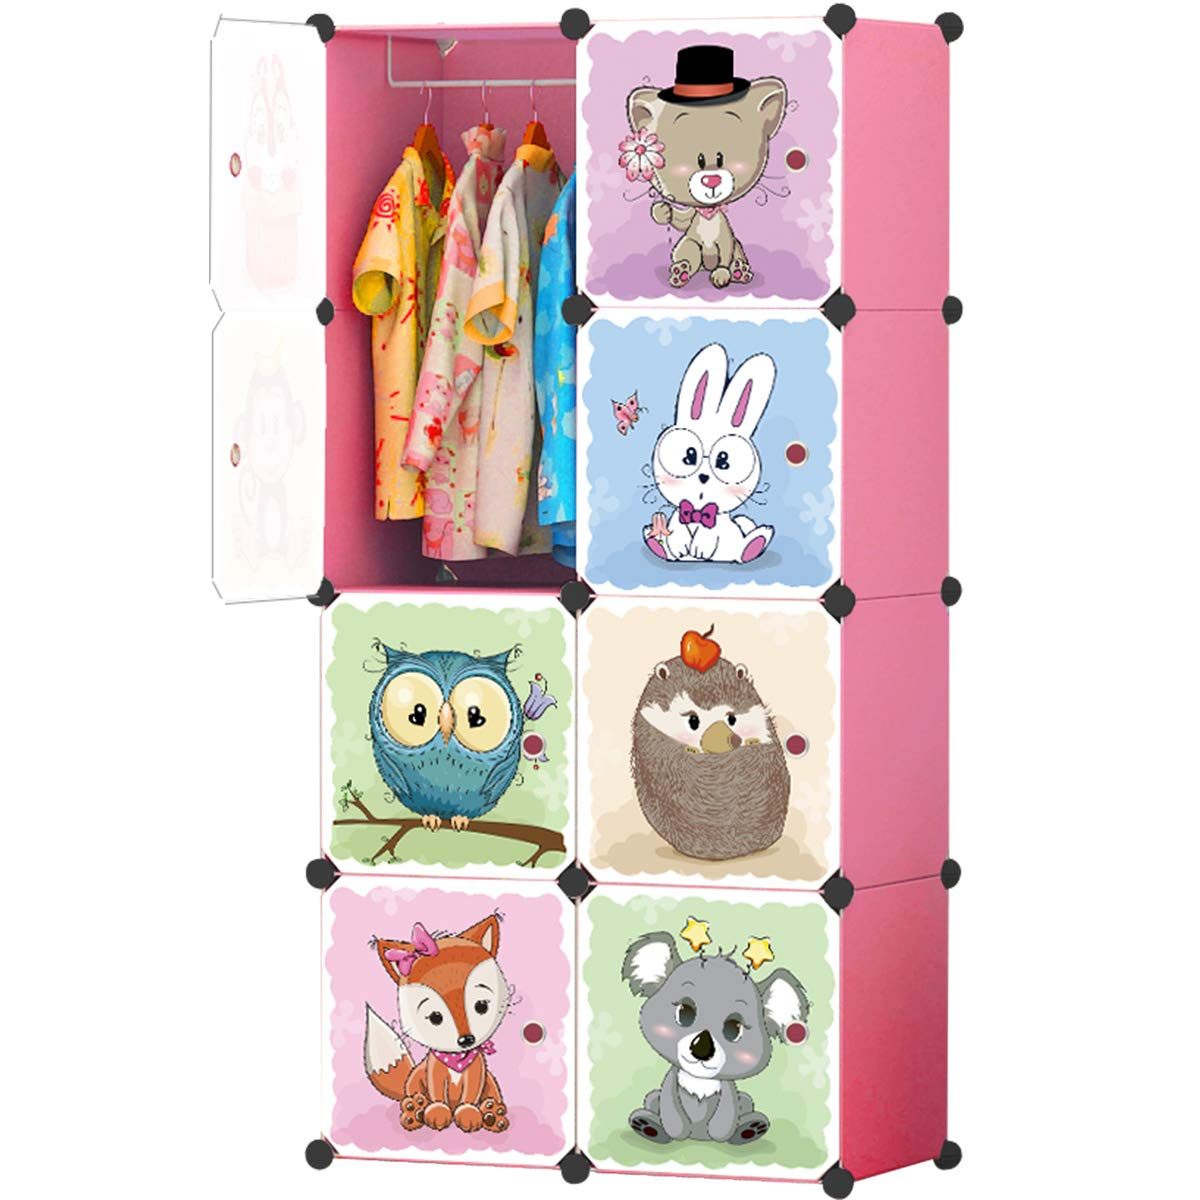 KOUSI Kid Dresser Portable Closet Wardrobe Children Bedroom Armoire Clothes Hanging Storage Rack Cube Organizer, Large & Study, Pink, 6 Cubes&1 Hanging Sections